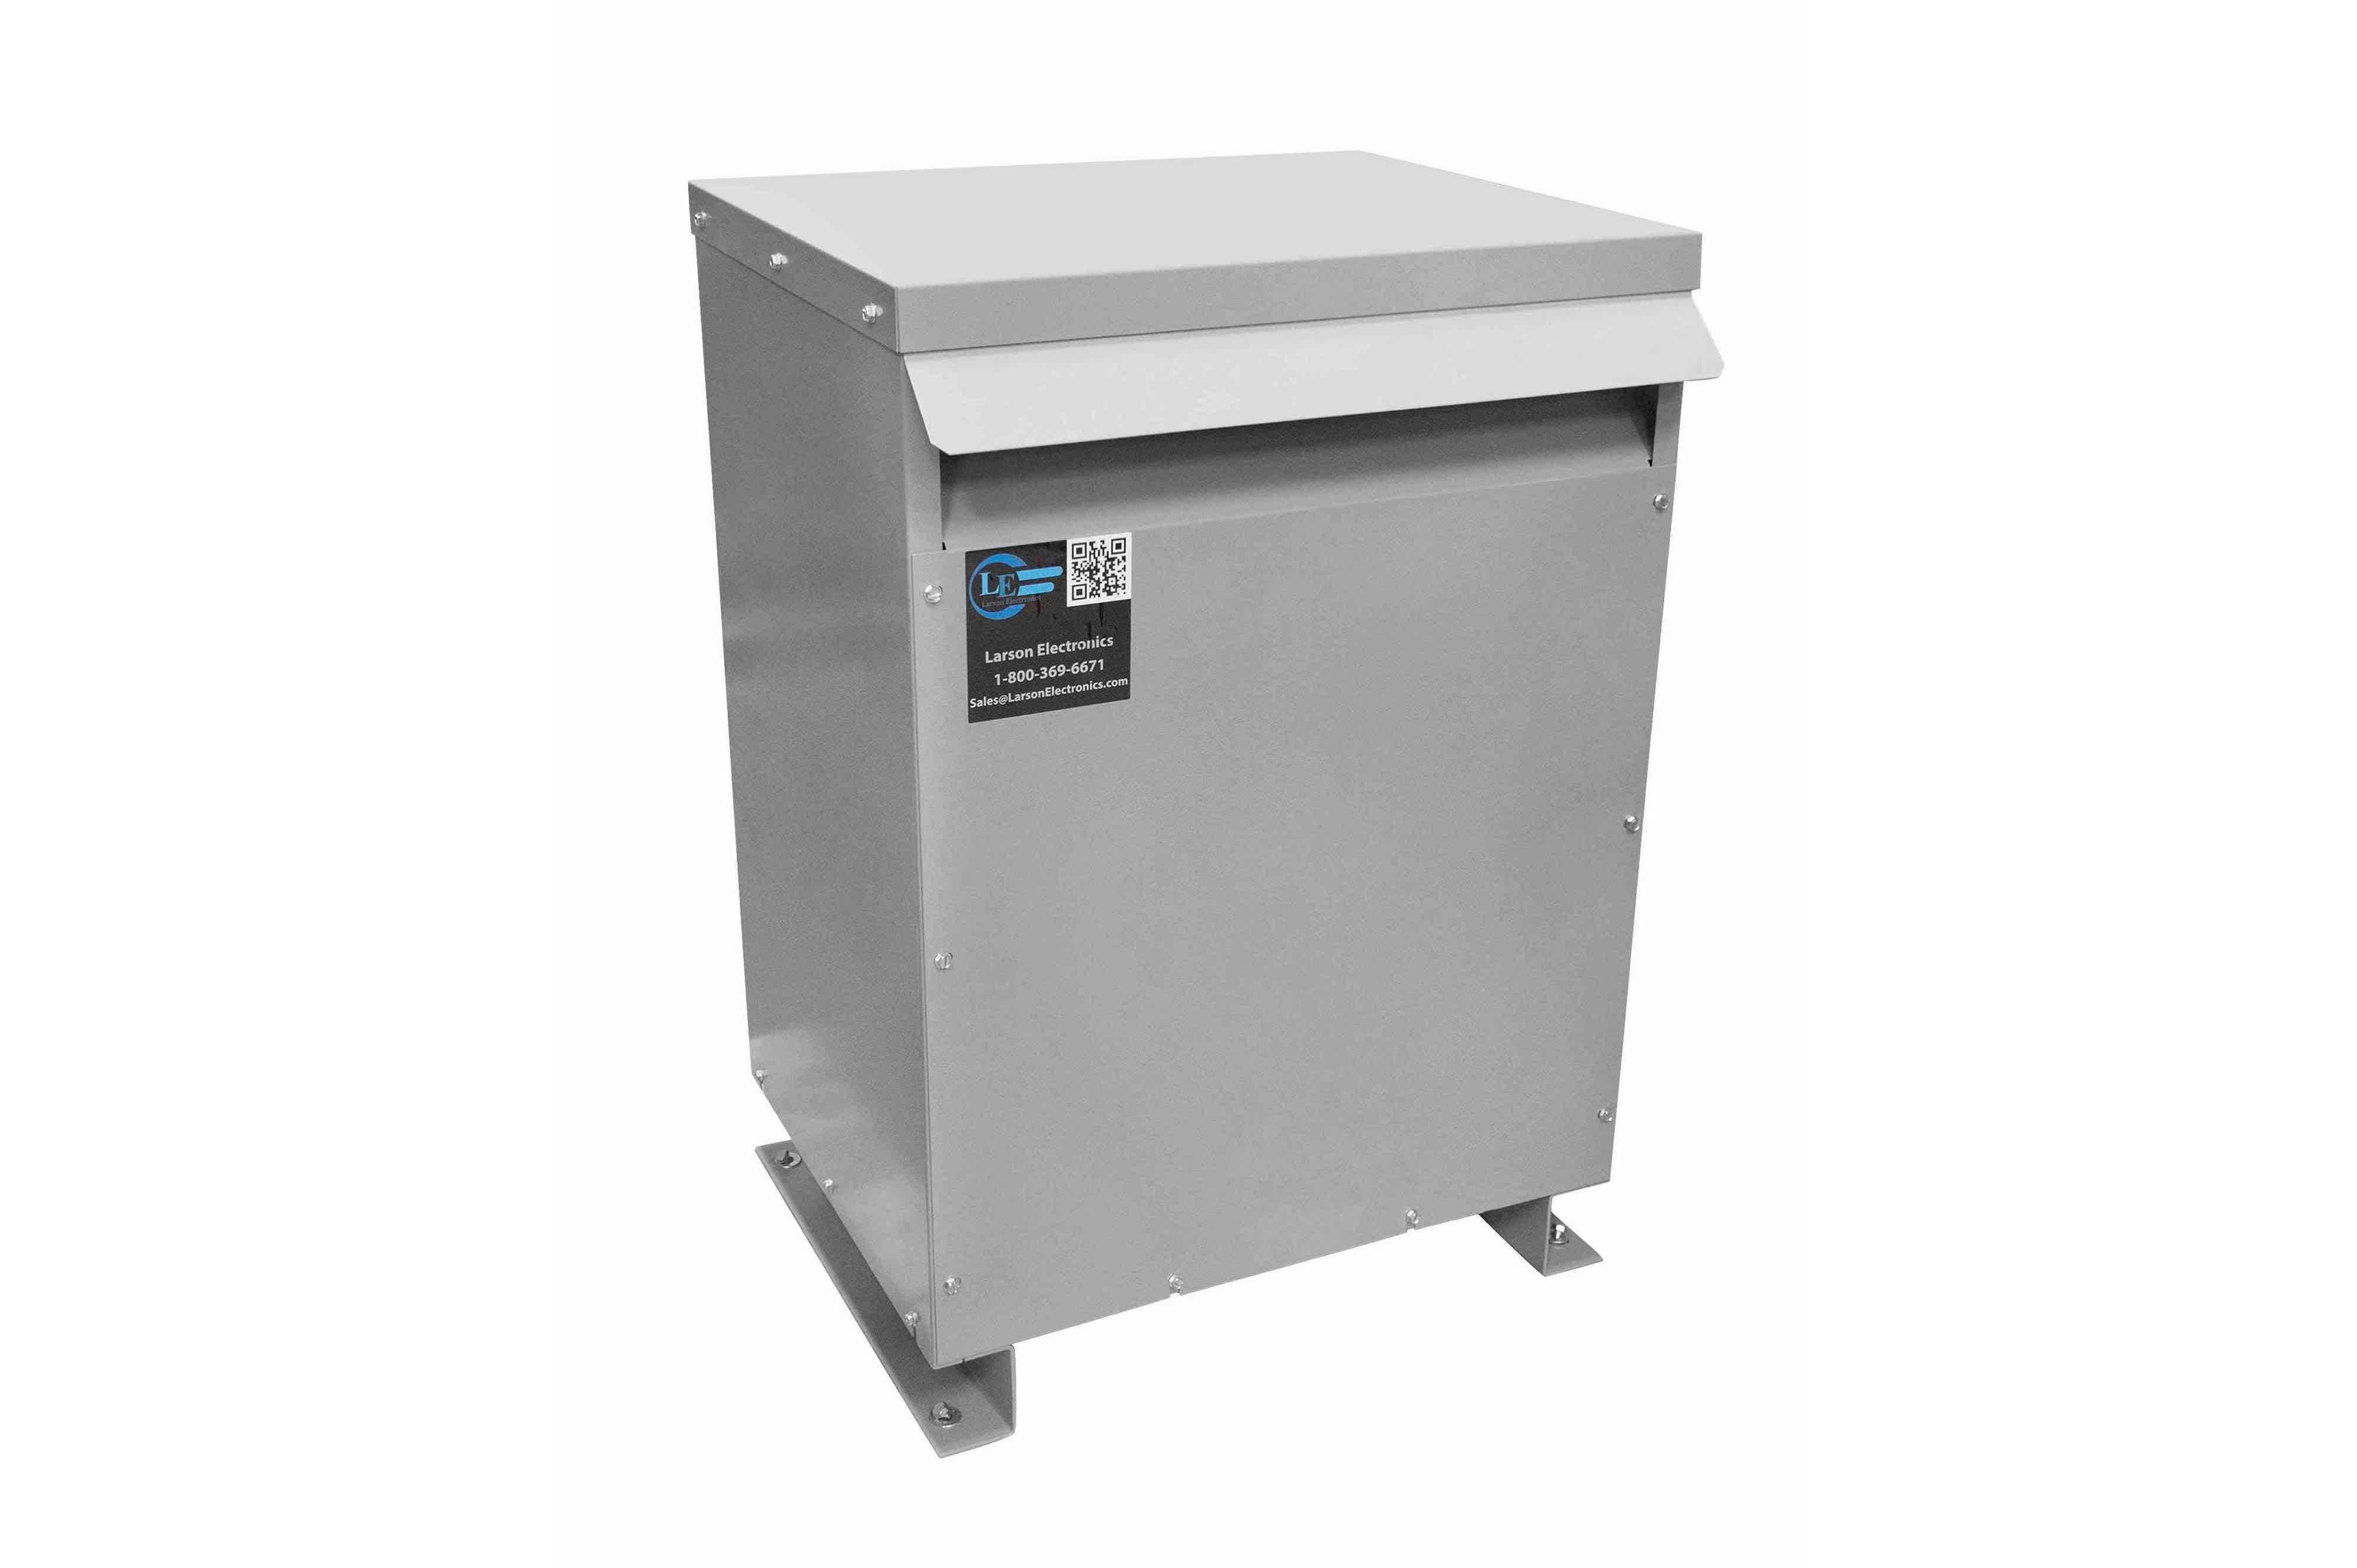 29 kVA 3PH Isolation Transformer, 575V Wye Primary, 415Y/240 Wye-N Secondary, N3R, Ventilated, 60 Hz